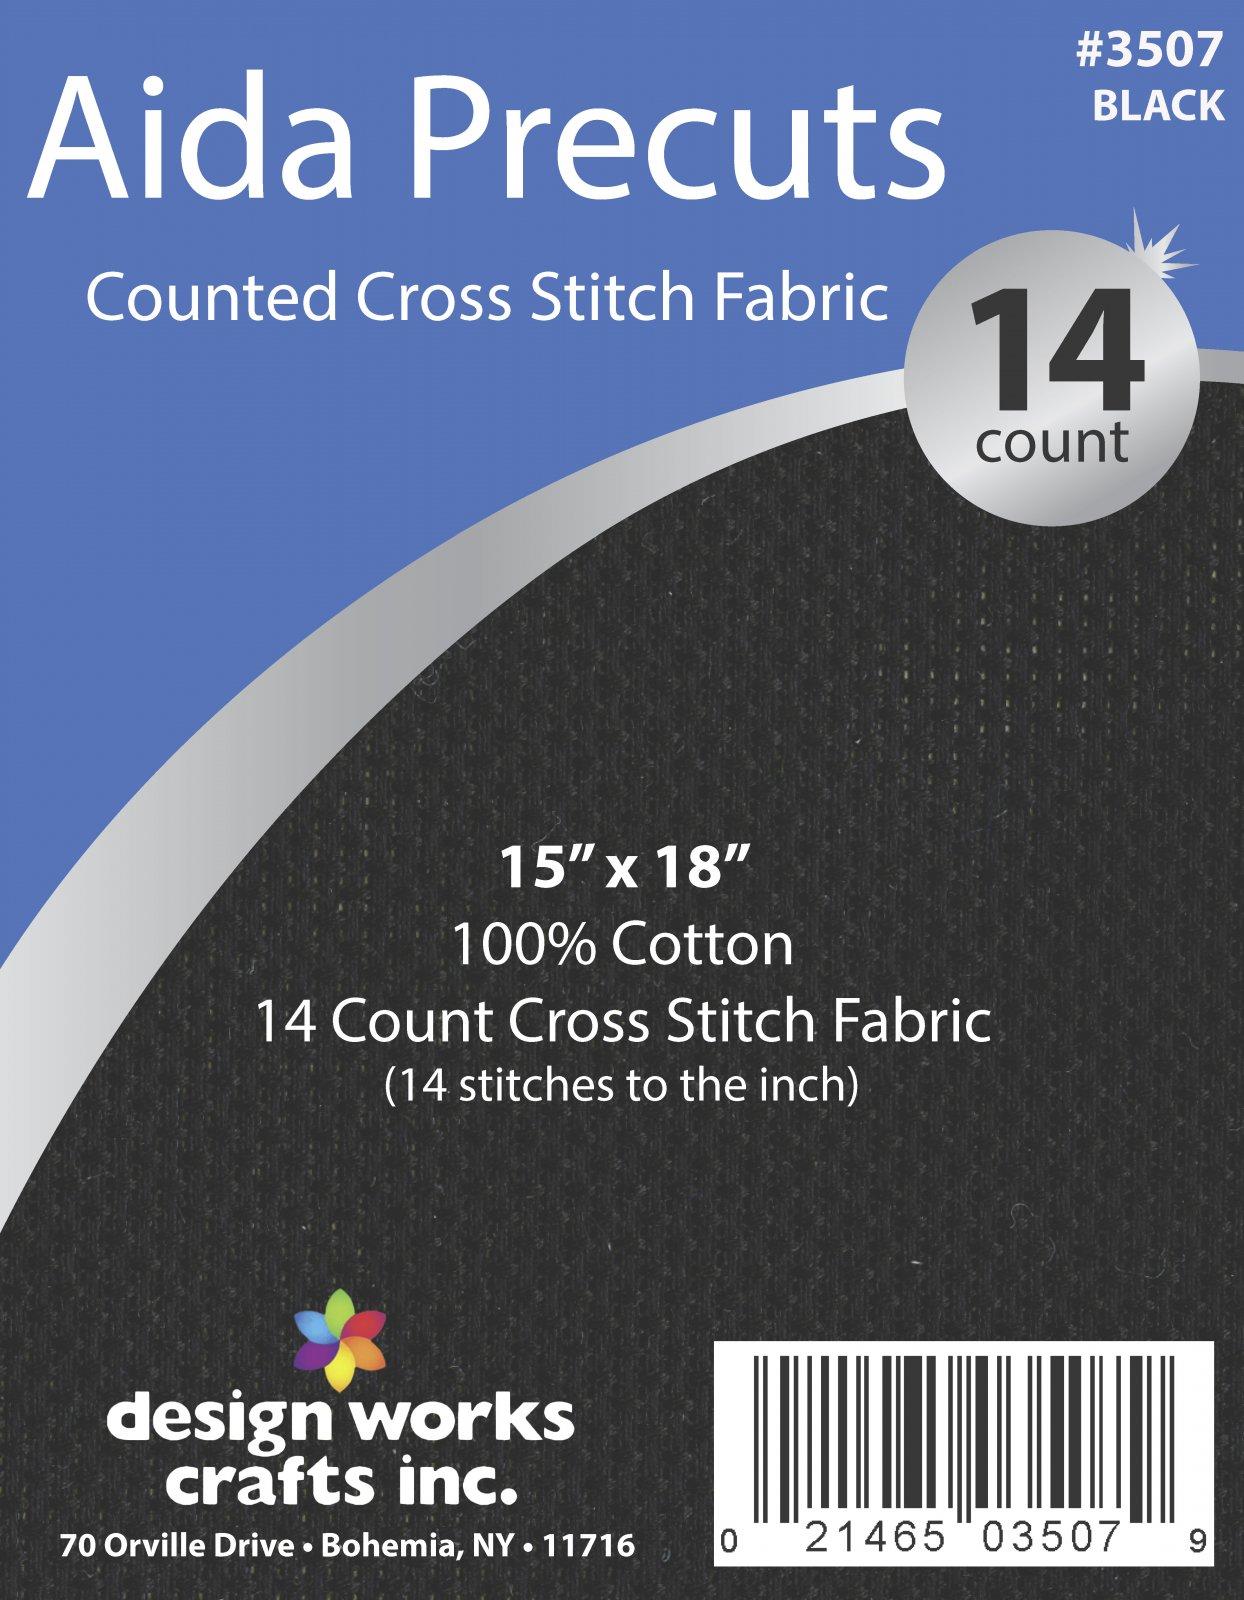 # 3507 - 14 Ct. Aida Pre-cut Counted Cross Stitch Fabric/Black - 15 x 18